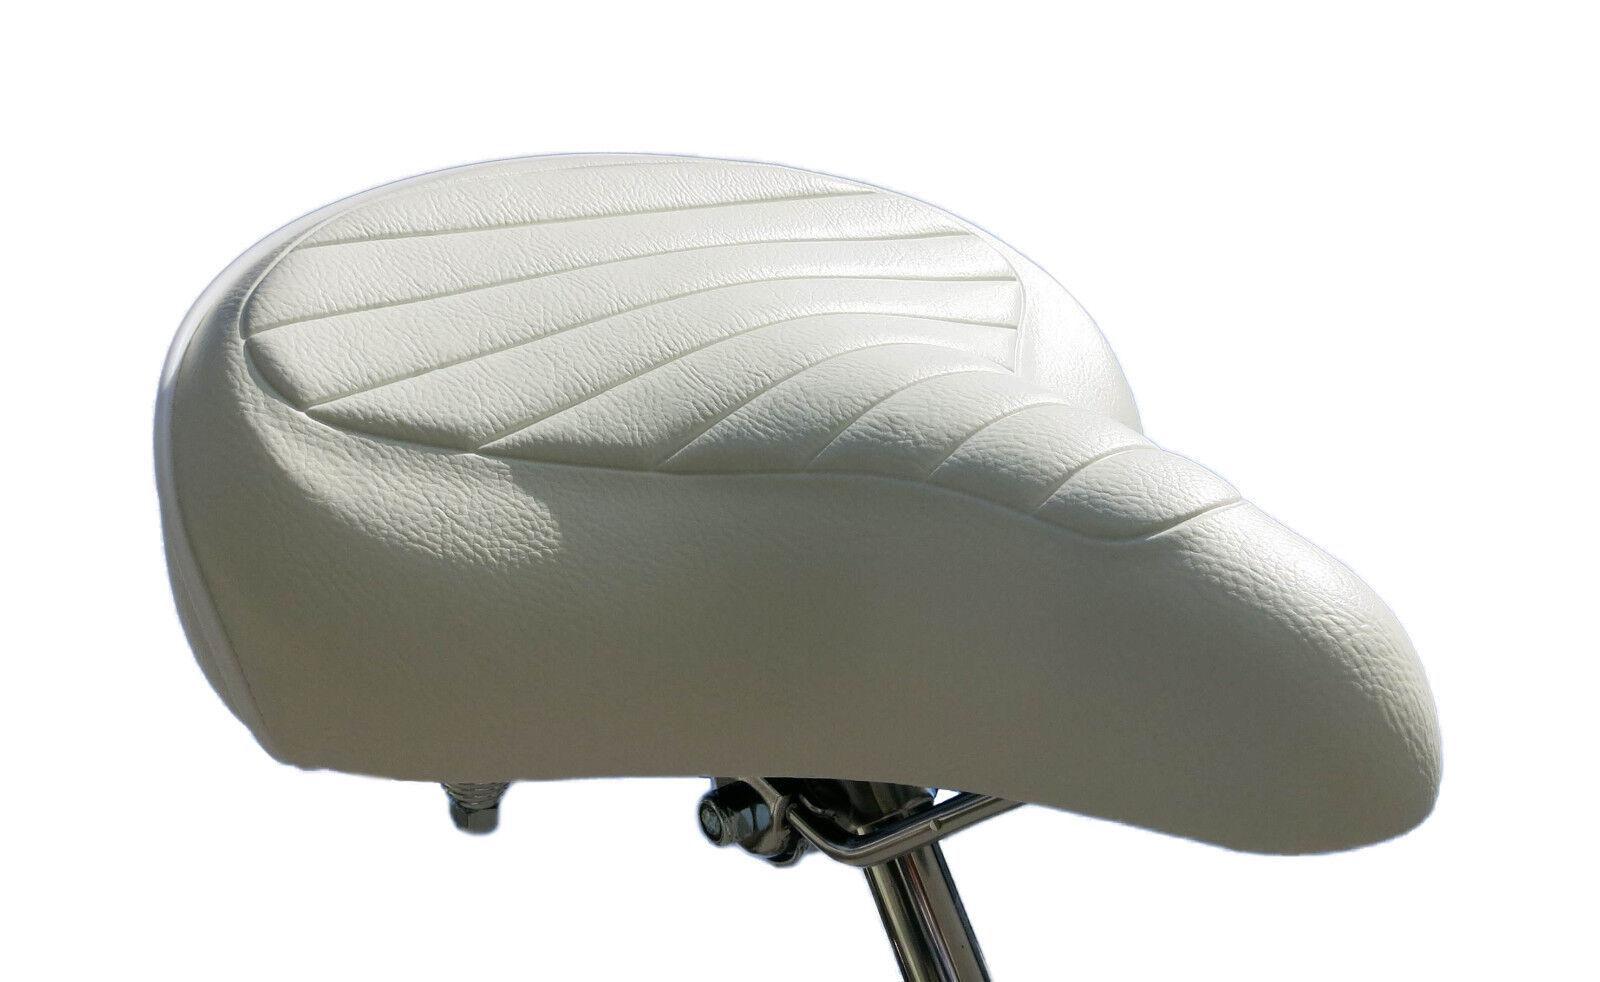 Selle  vélo Cruiser 70's white chopper beachcruiser américain saddle bicycle  cheap designer brands